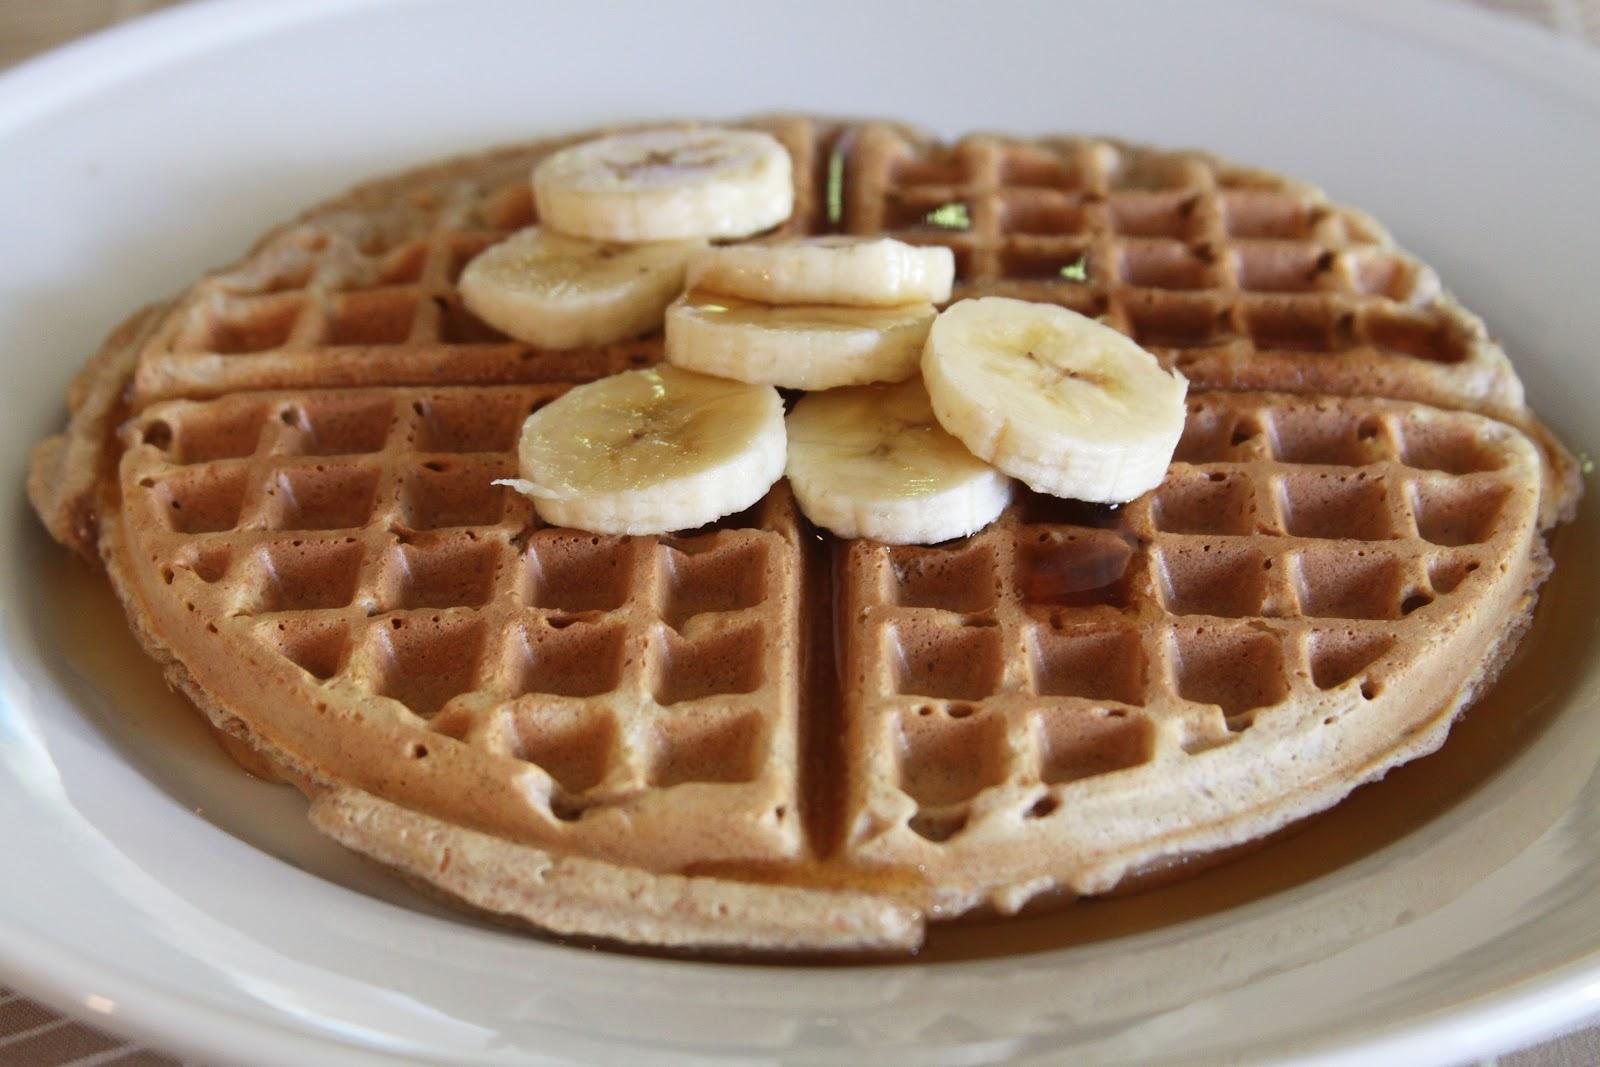 Whole Wheat Waffles with Banana | Espresso and Cream